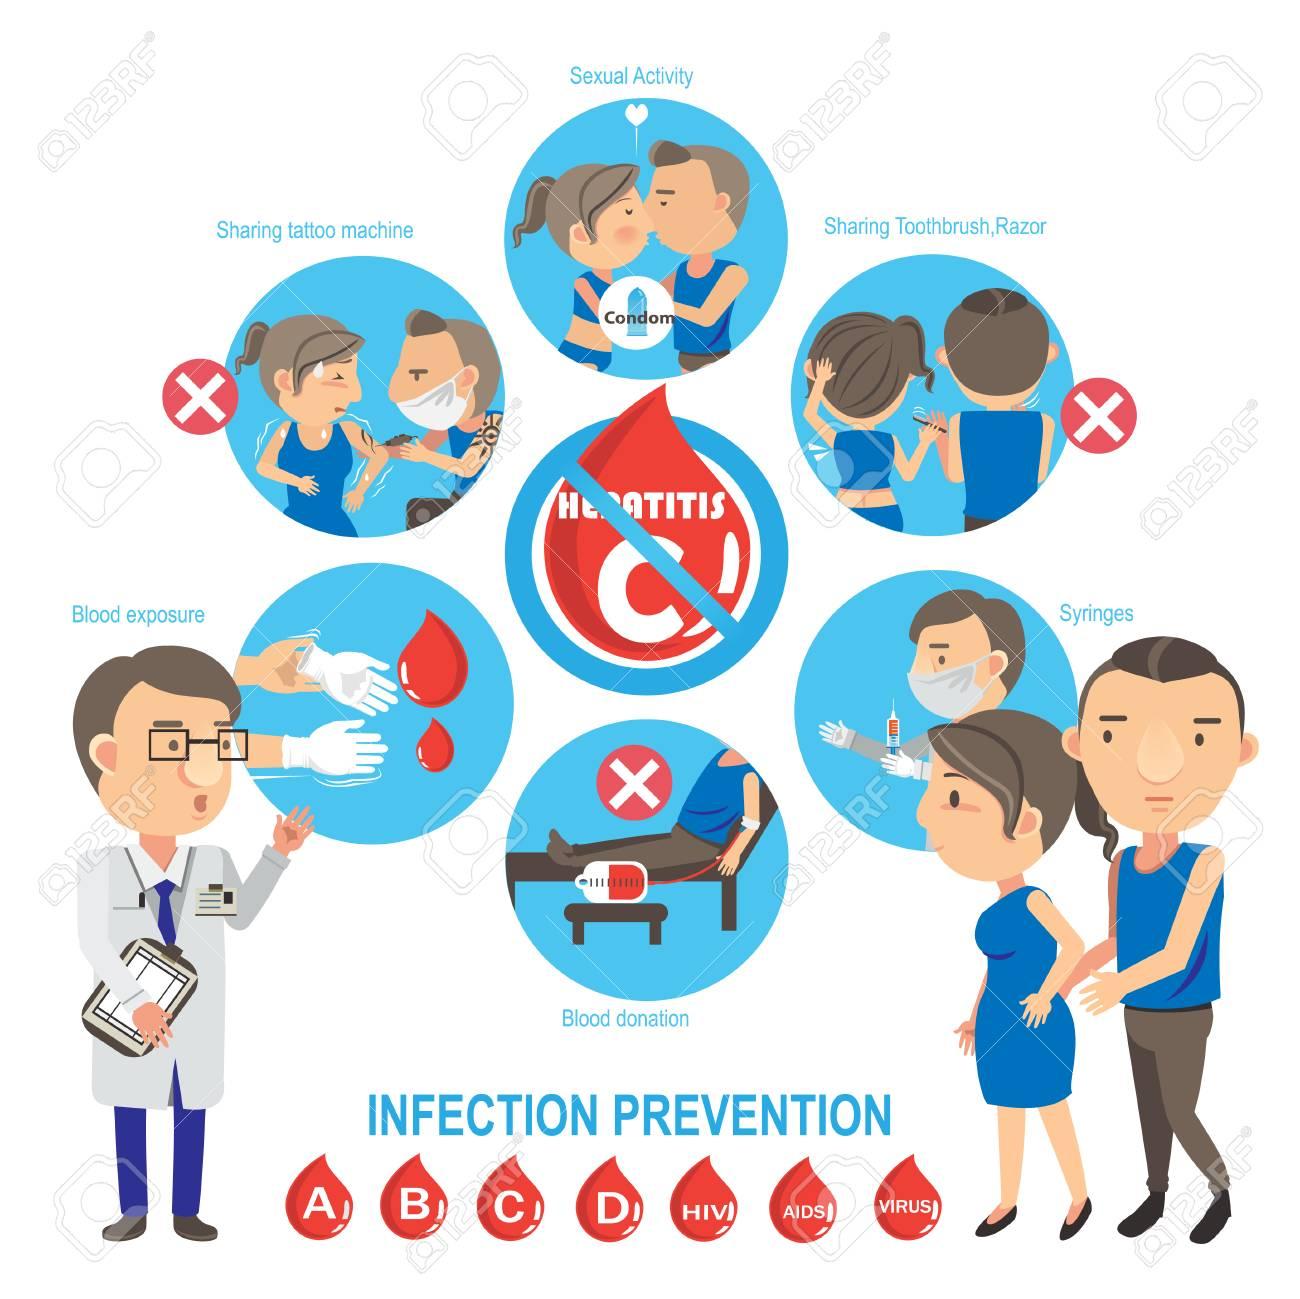 Prevention of hepatitis c Info Graphics.Vector illustrations - 92936868